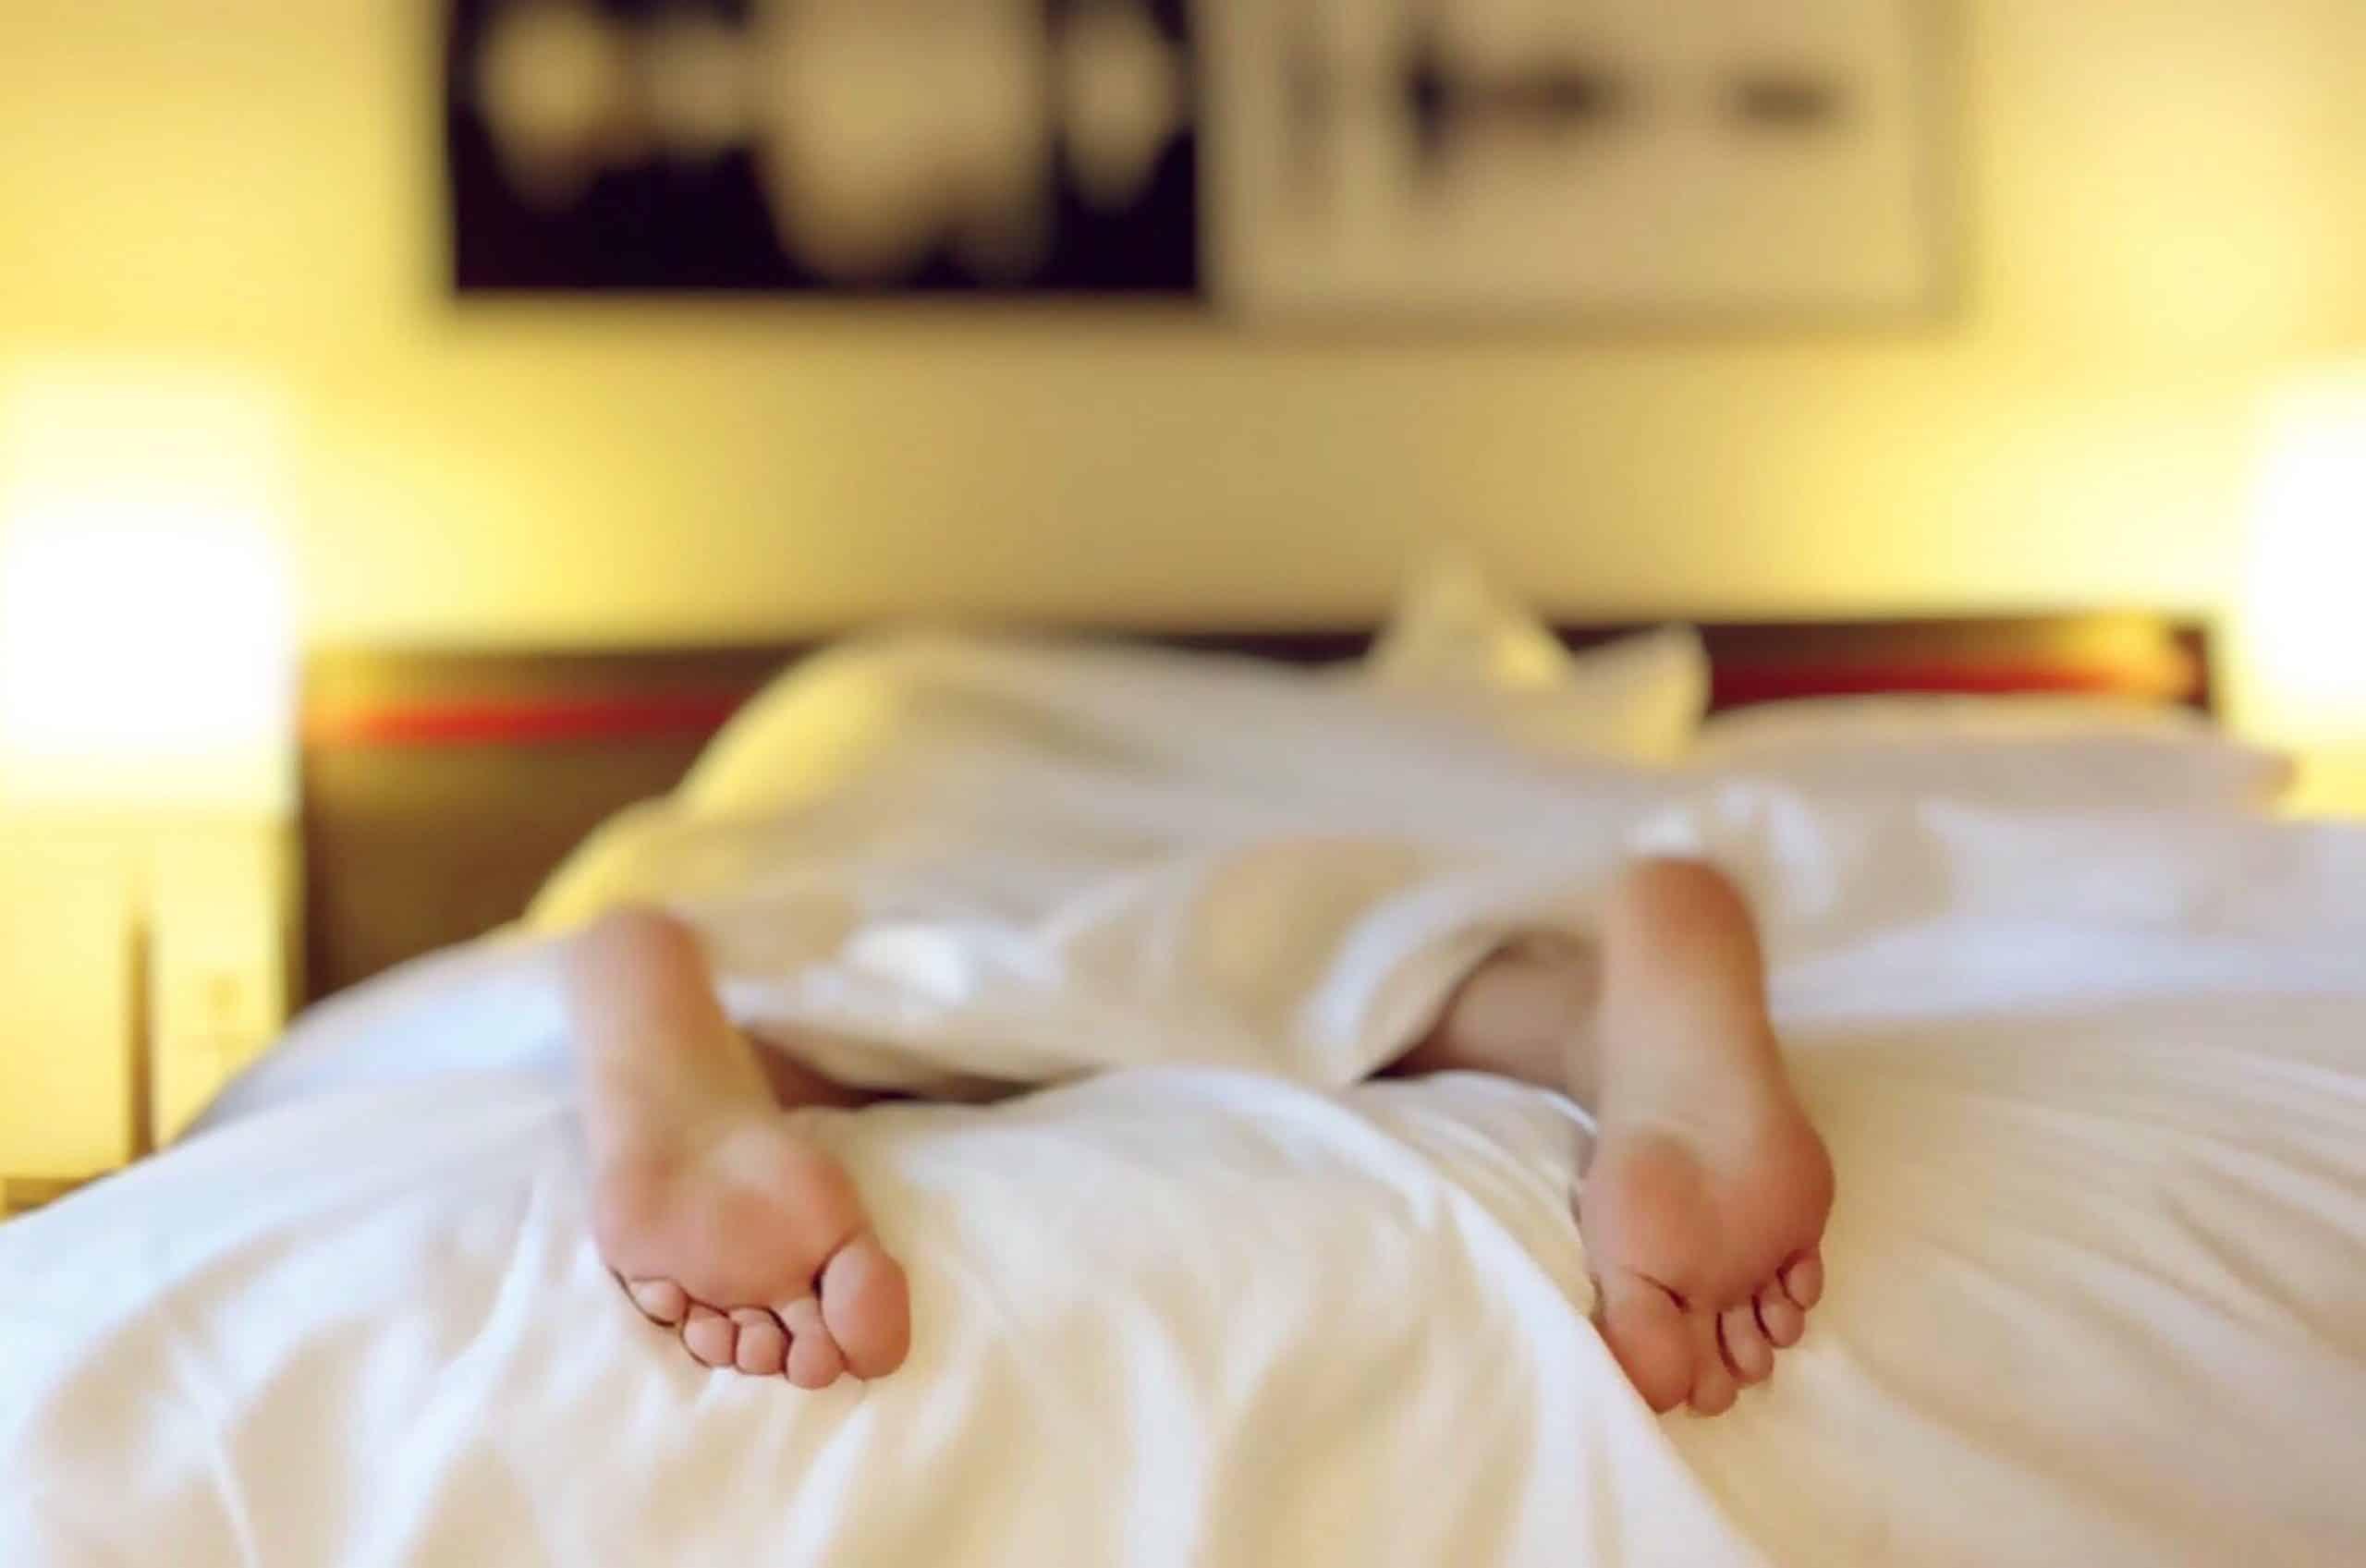 Intieme massage: Verschillende gigolo en escort verhalen